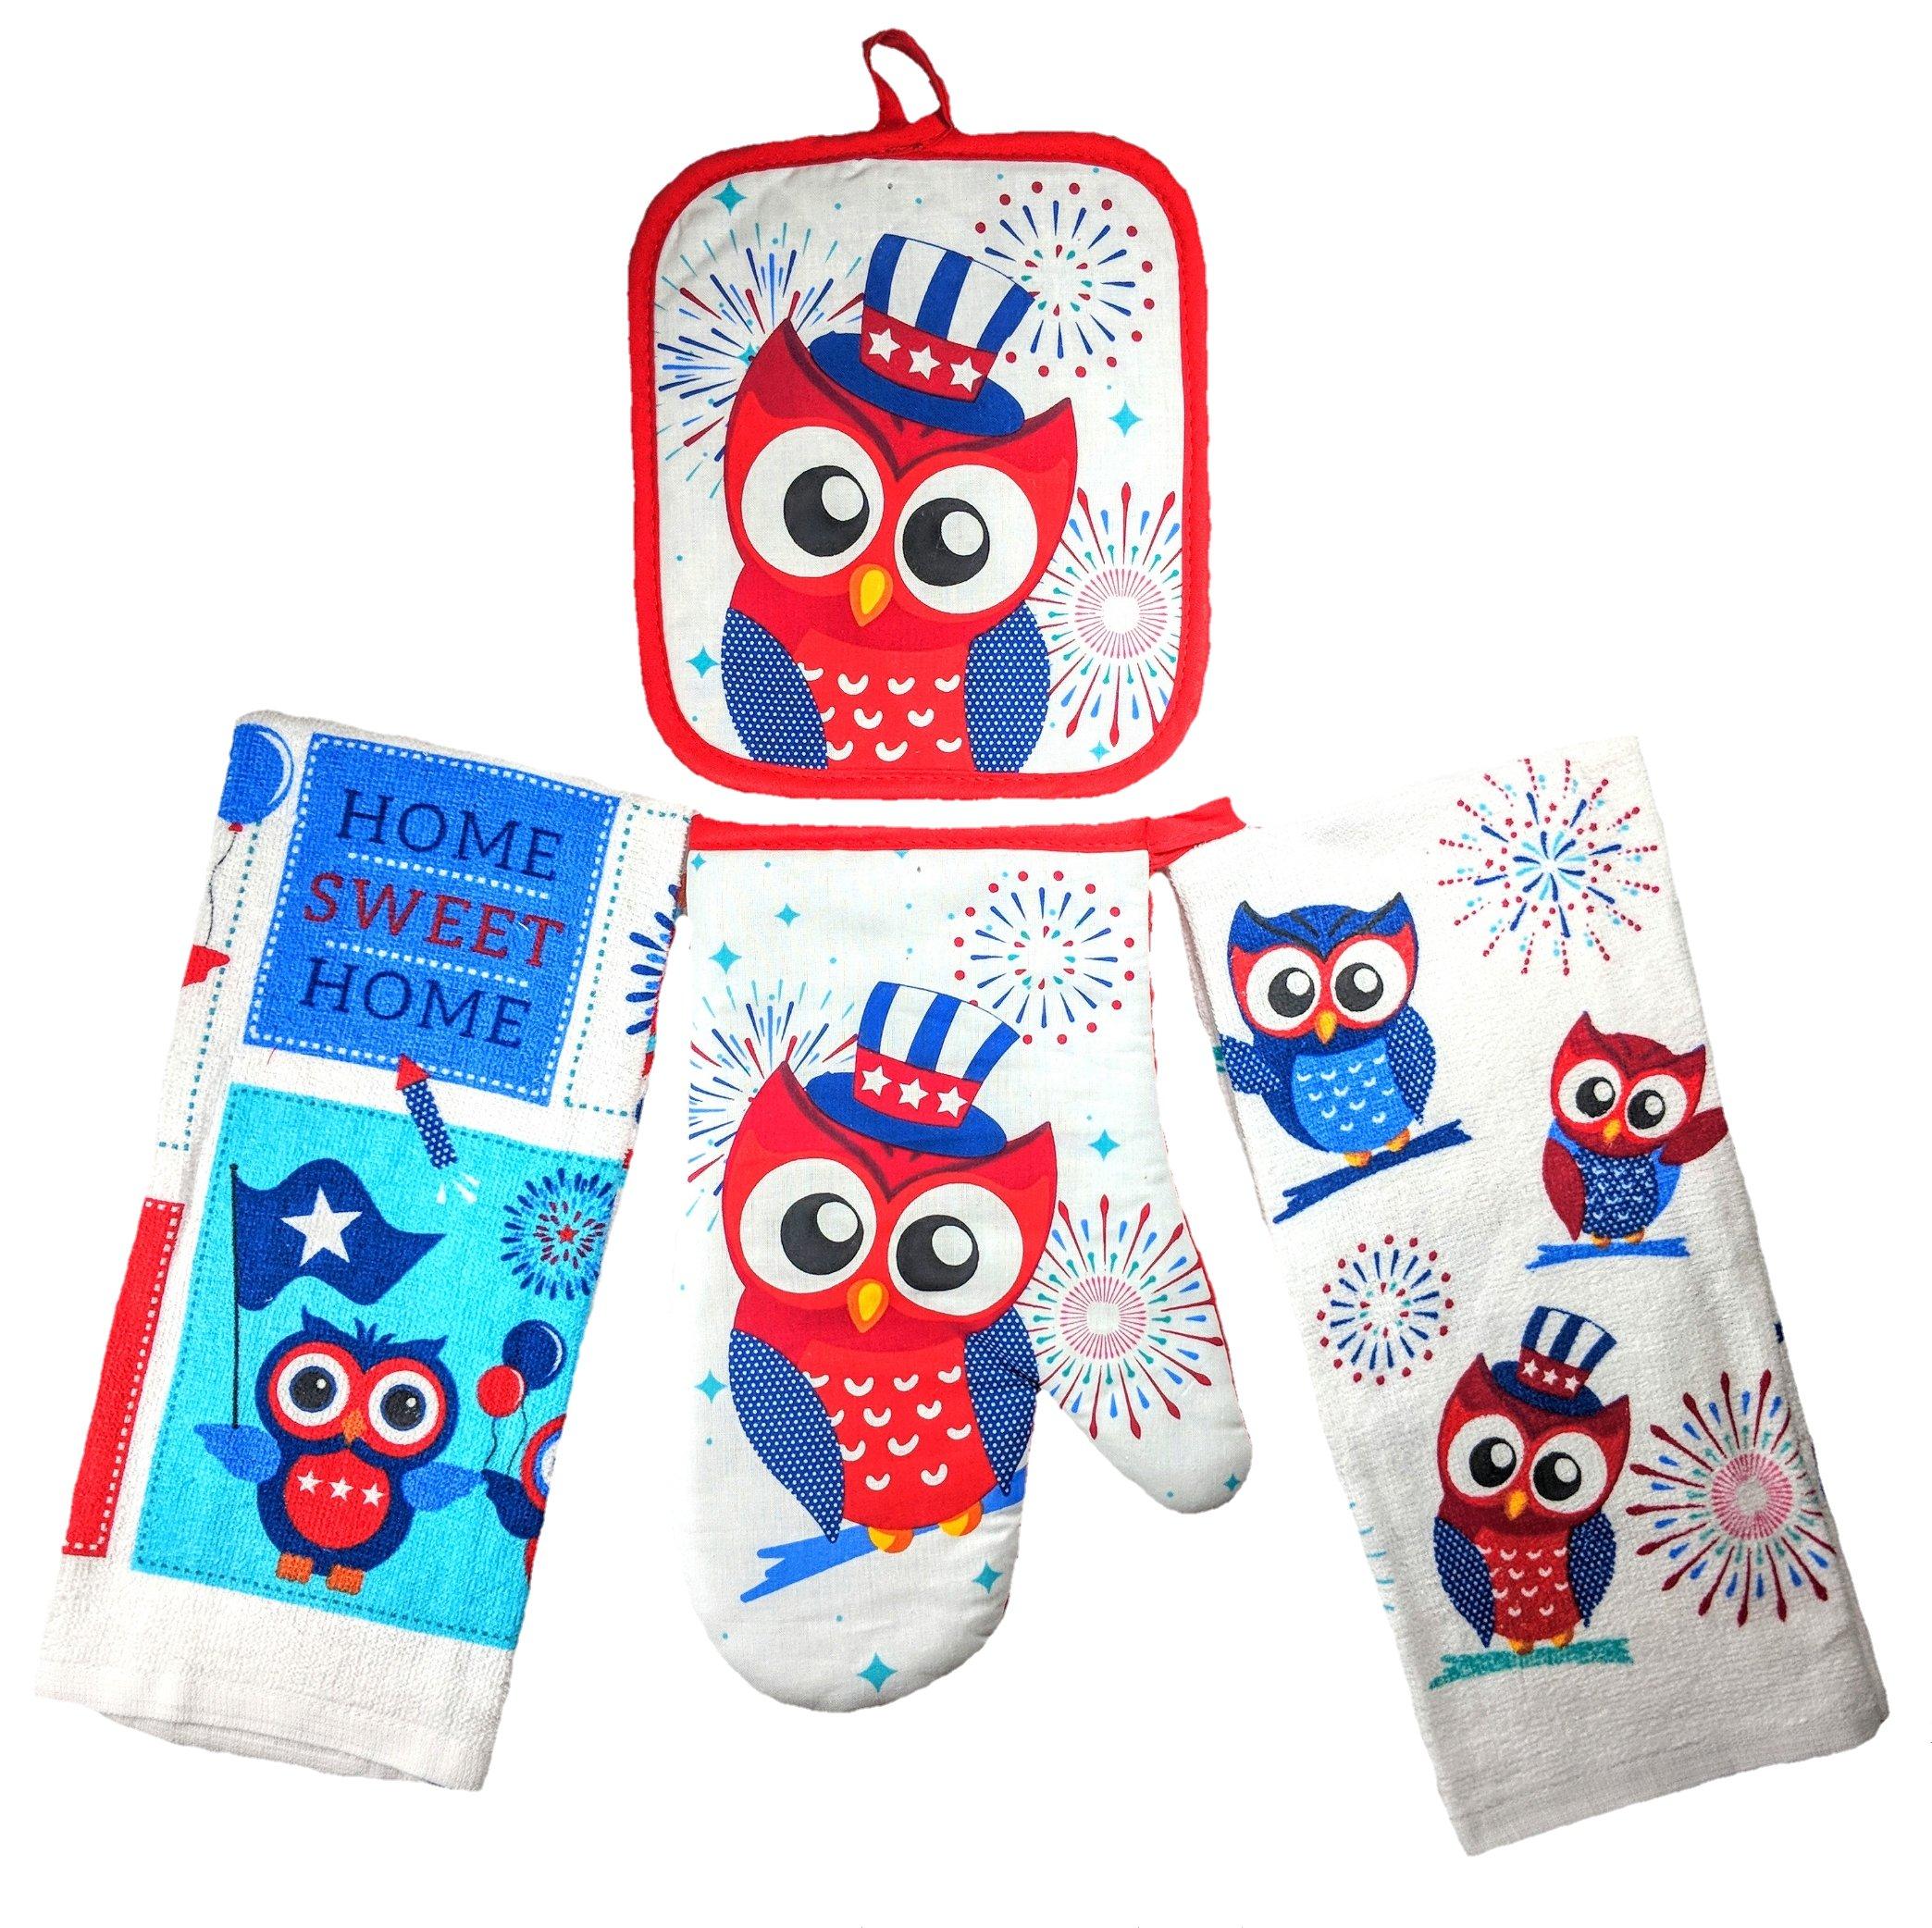 Summer Fun Products Mainstays 4 Piece Kitchen Bundle - Pot Holder, Oven Mitt, 2 Dish Towels - Fun Design (Patriotic Owl)